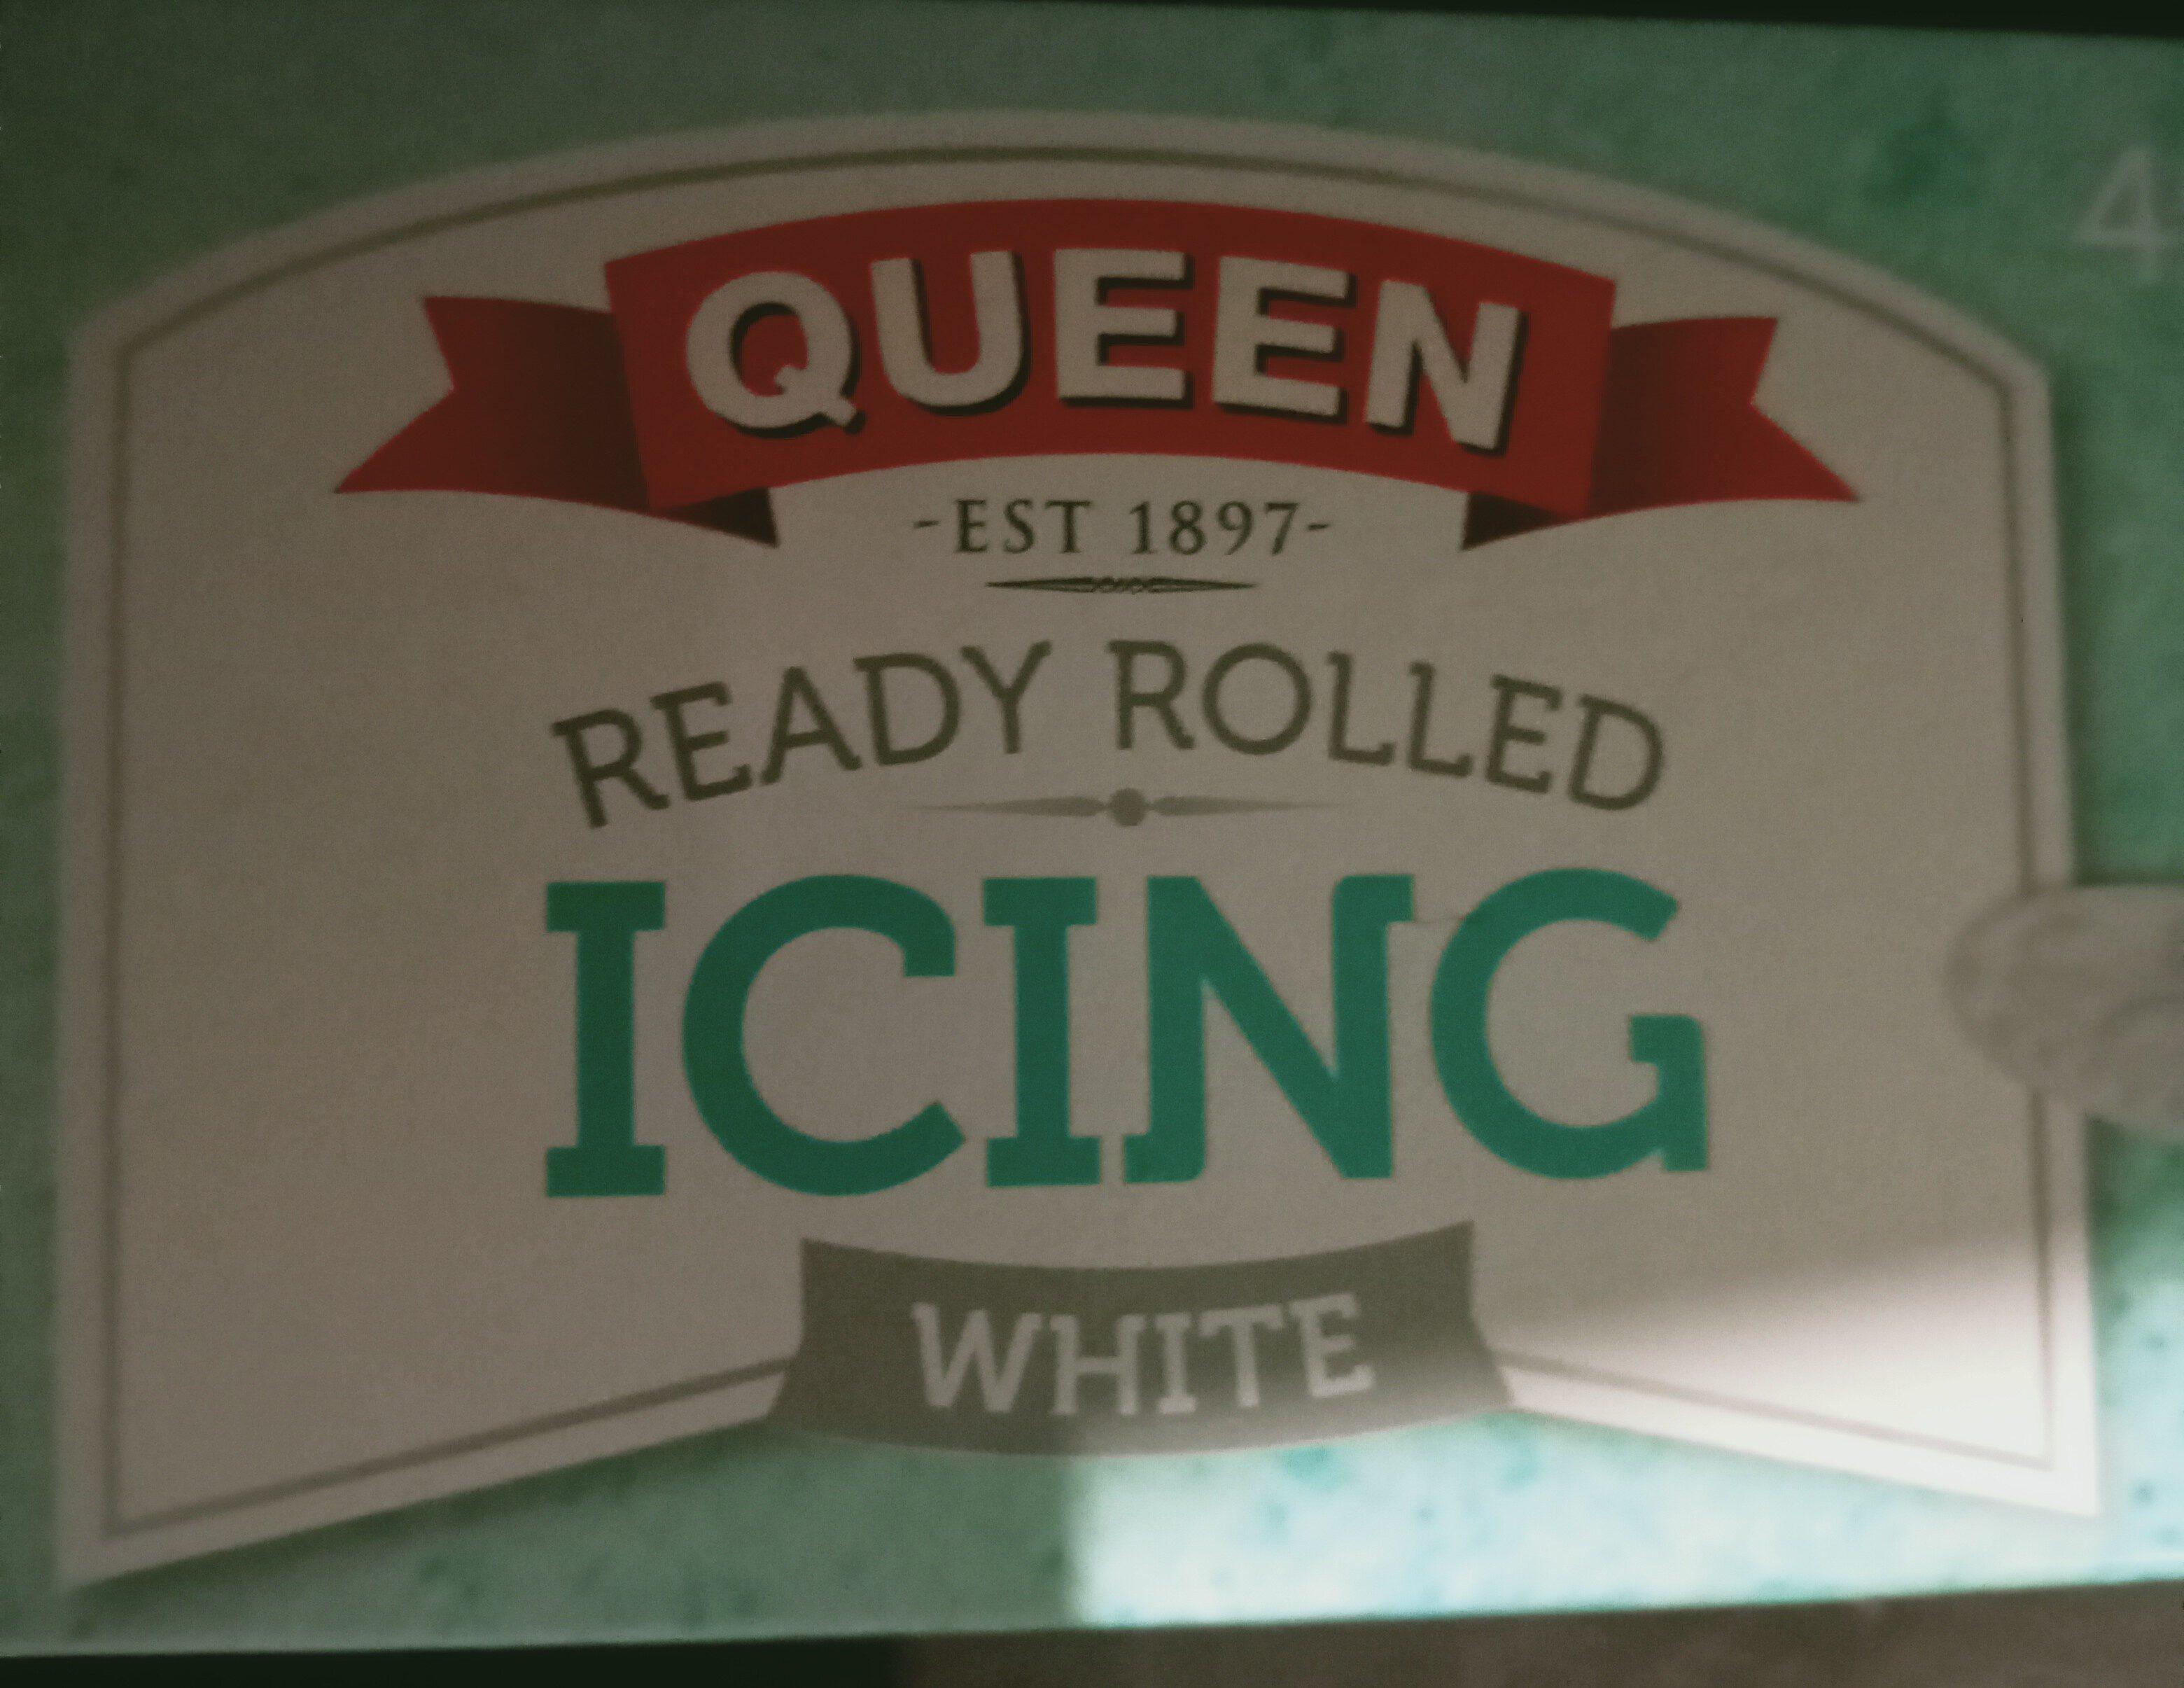 queen ready rolled icing white - Produit - en